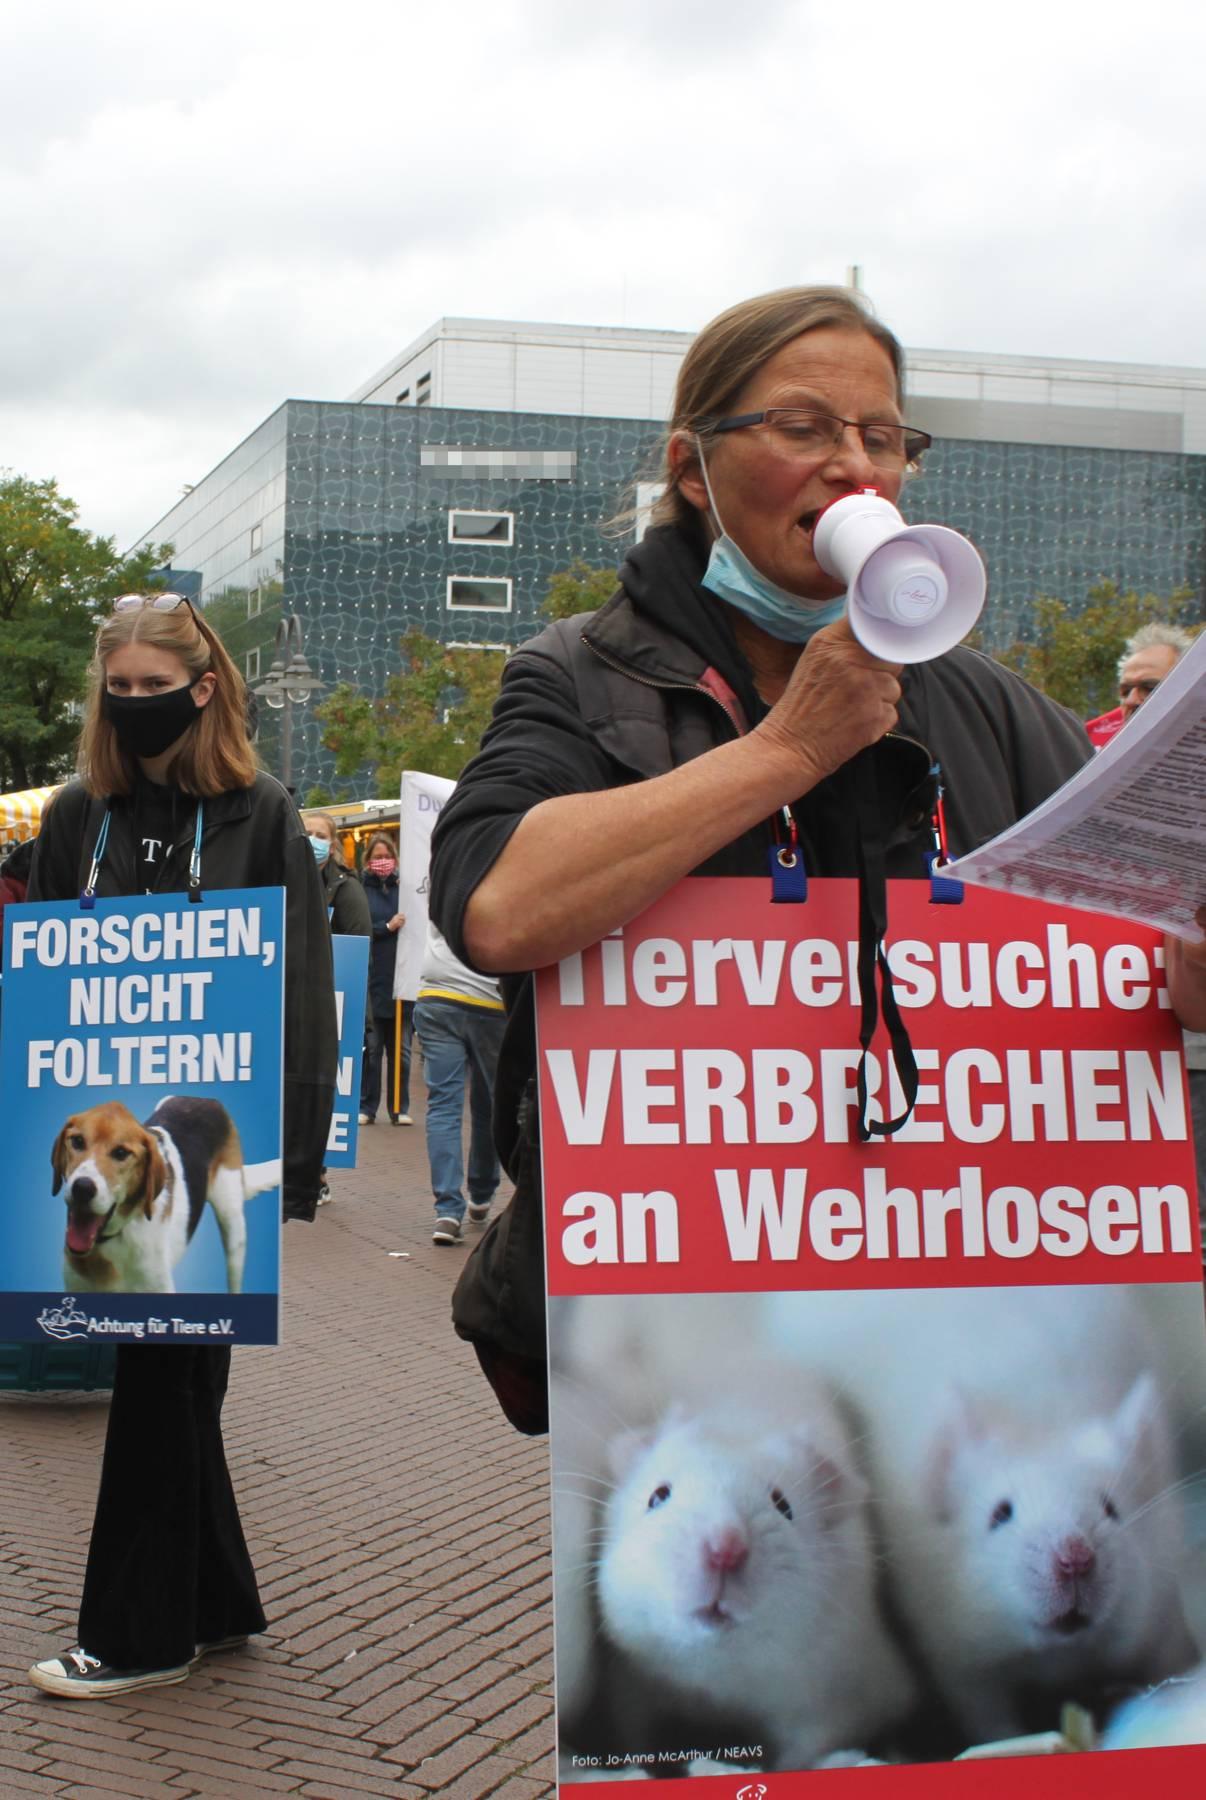 Demo_gegen_Tierversuche_Demonstrierende_Demozug_Rede